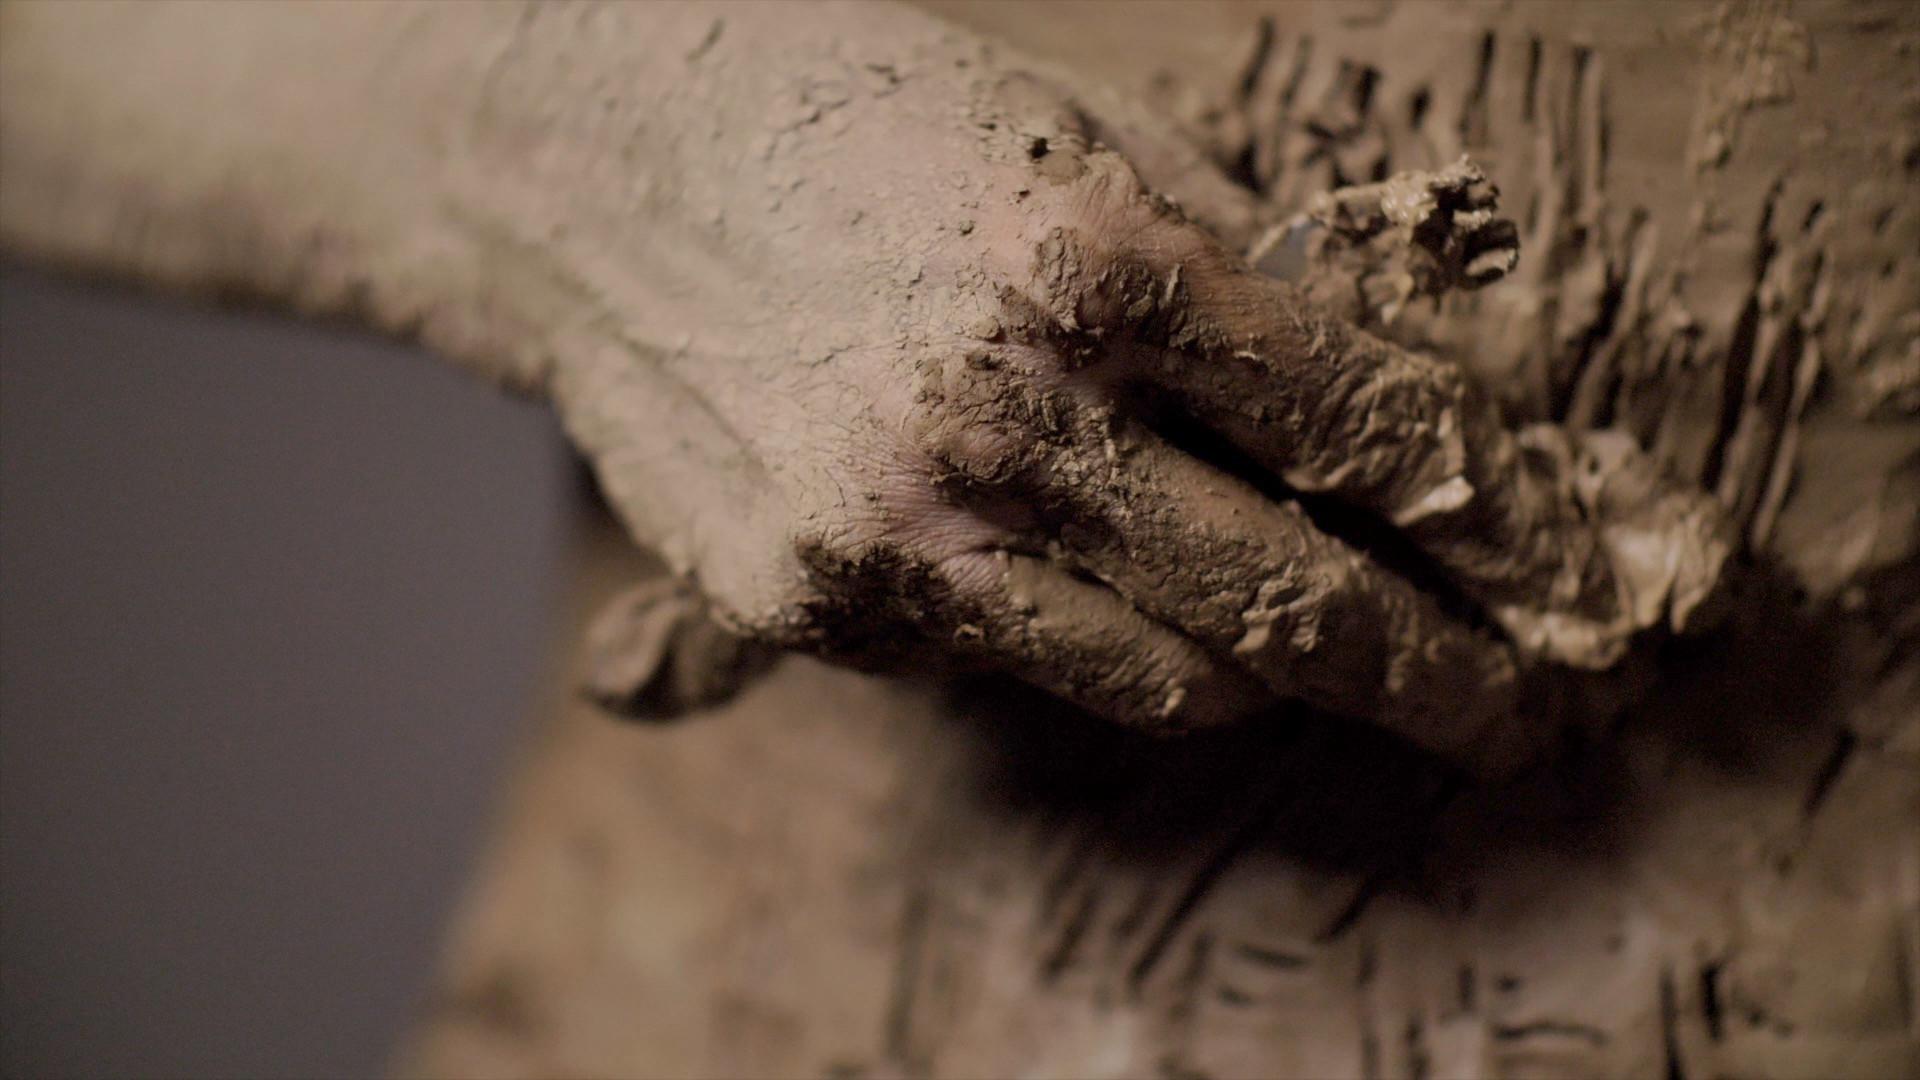 Belinda Blignaut | Working From The Inside | 2019 | Performance Film Still